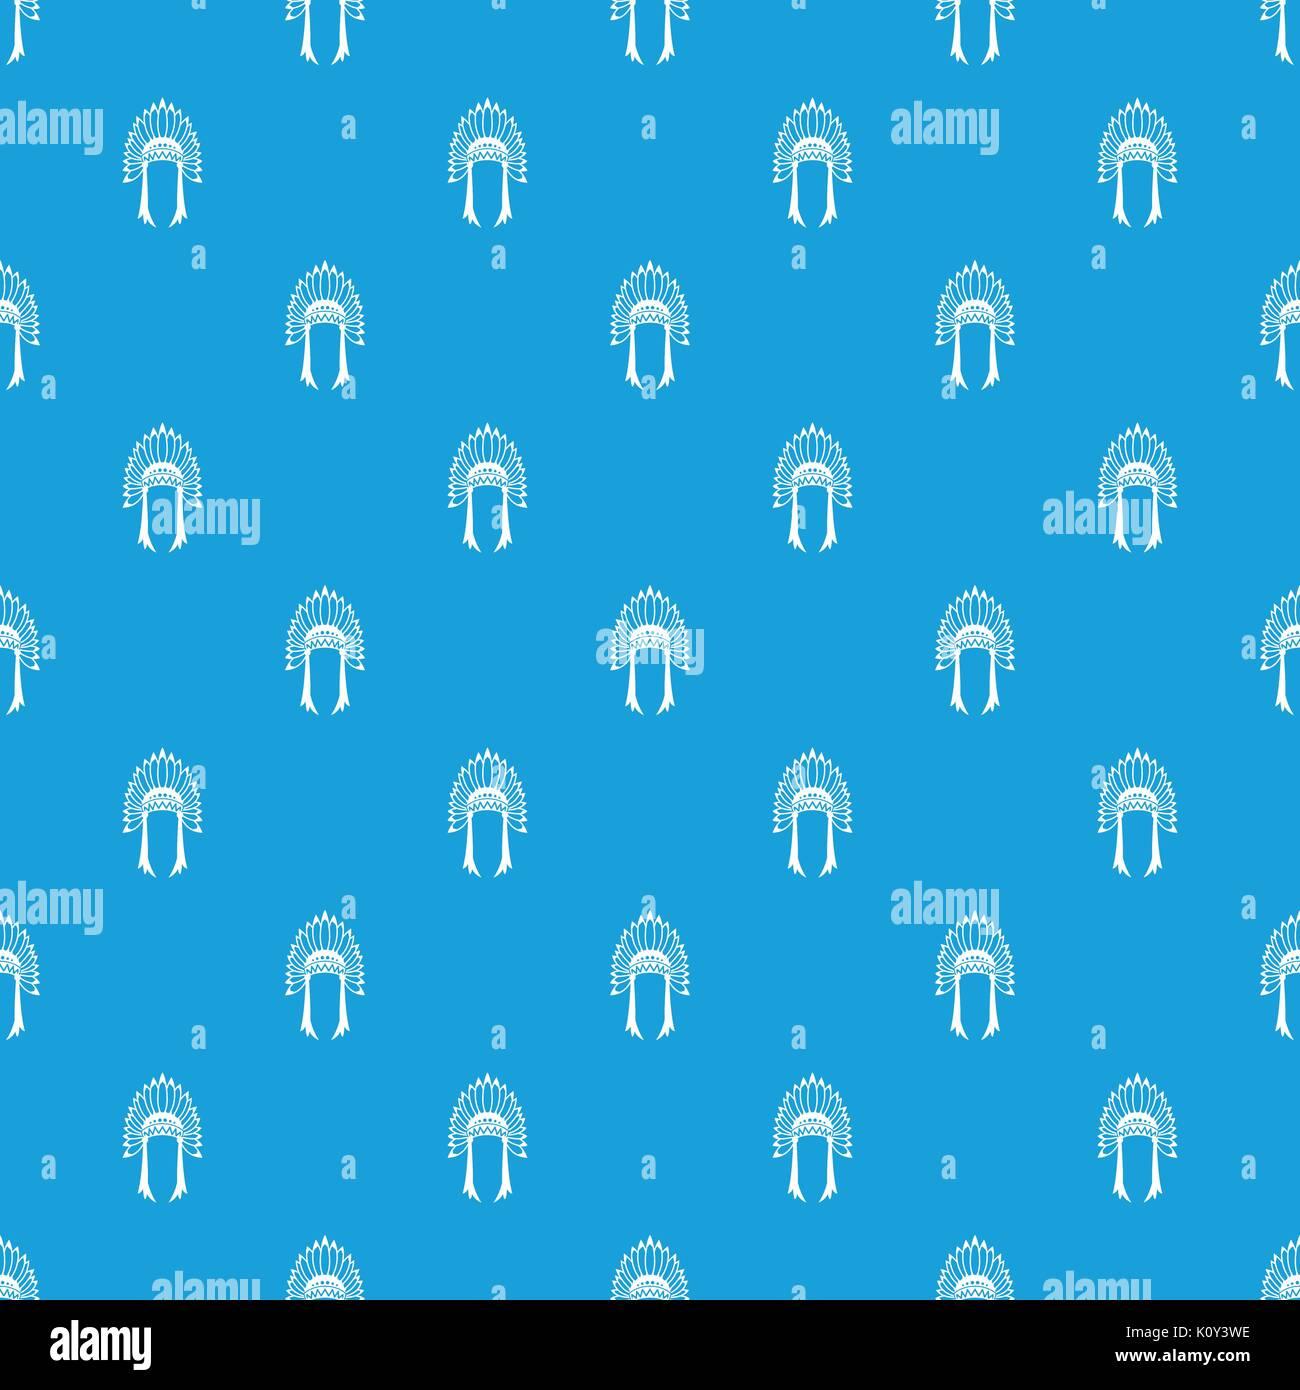 Indian headdress pattern seamless blue - Stock Image